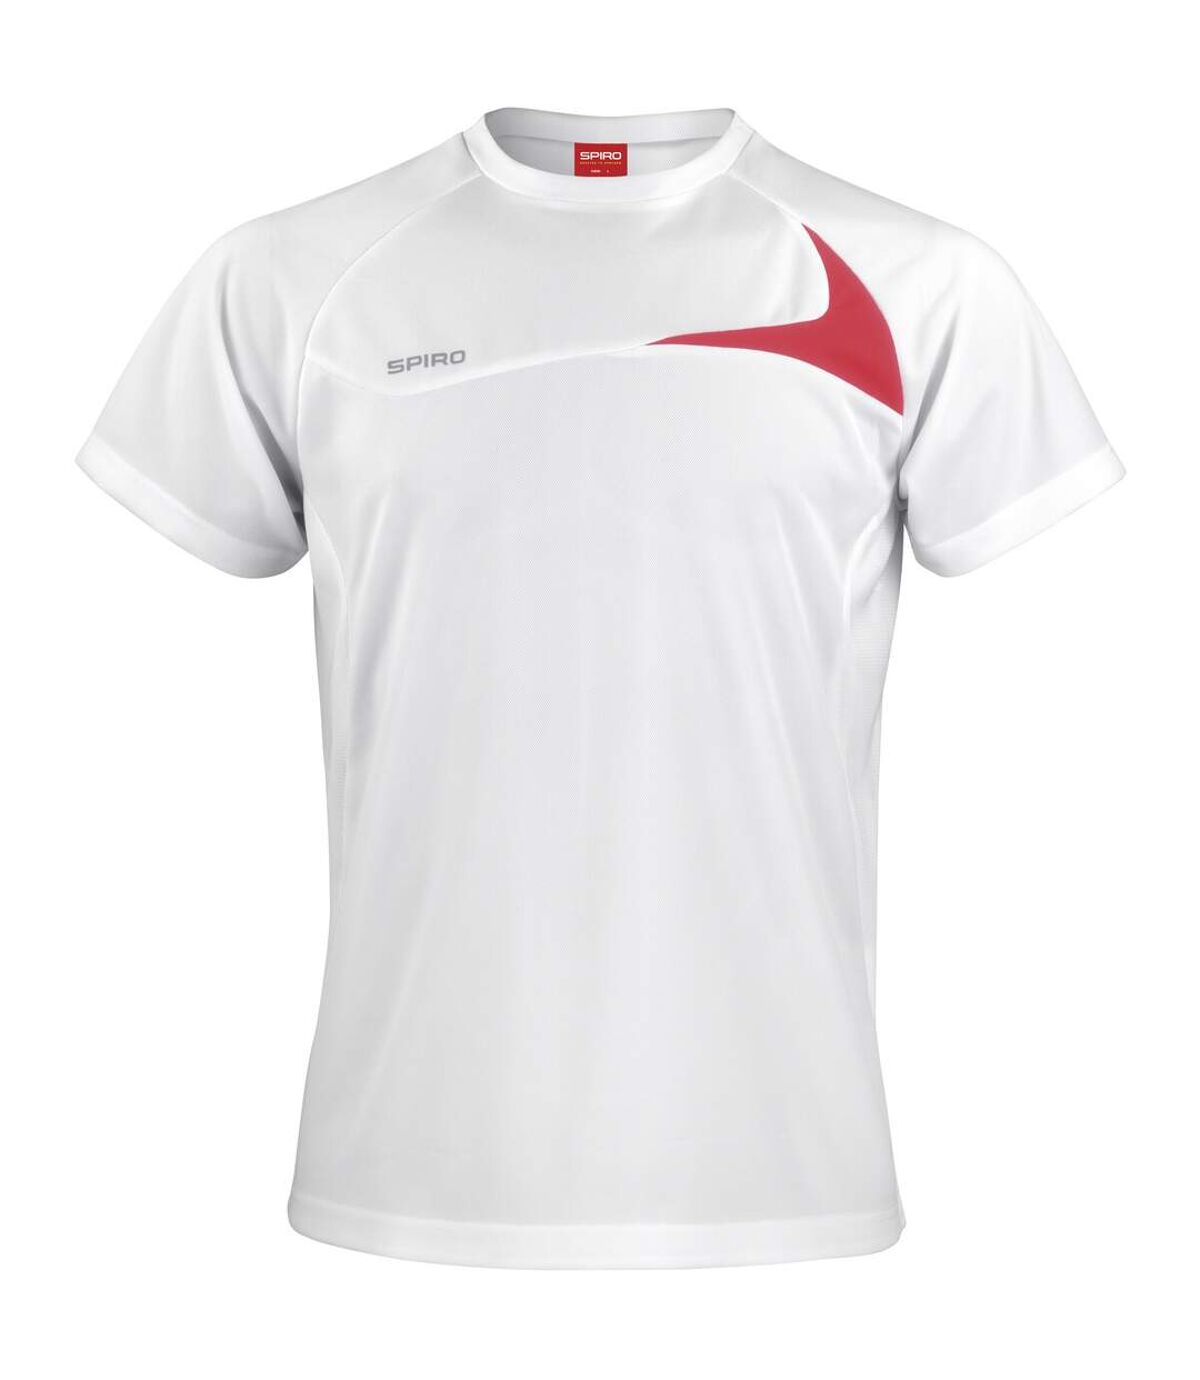 Spiro Mens Sports Dash Performance Training Shirt (Aqua/Grey) - UTRW1476